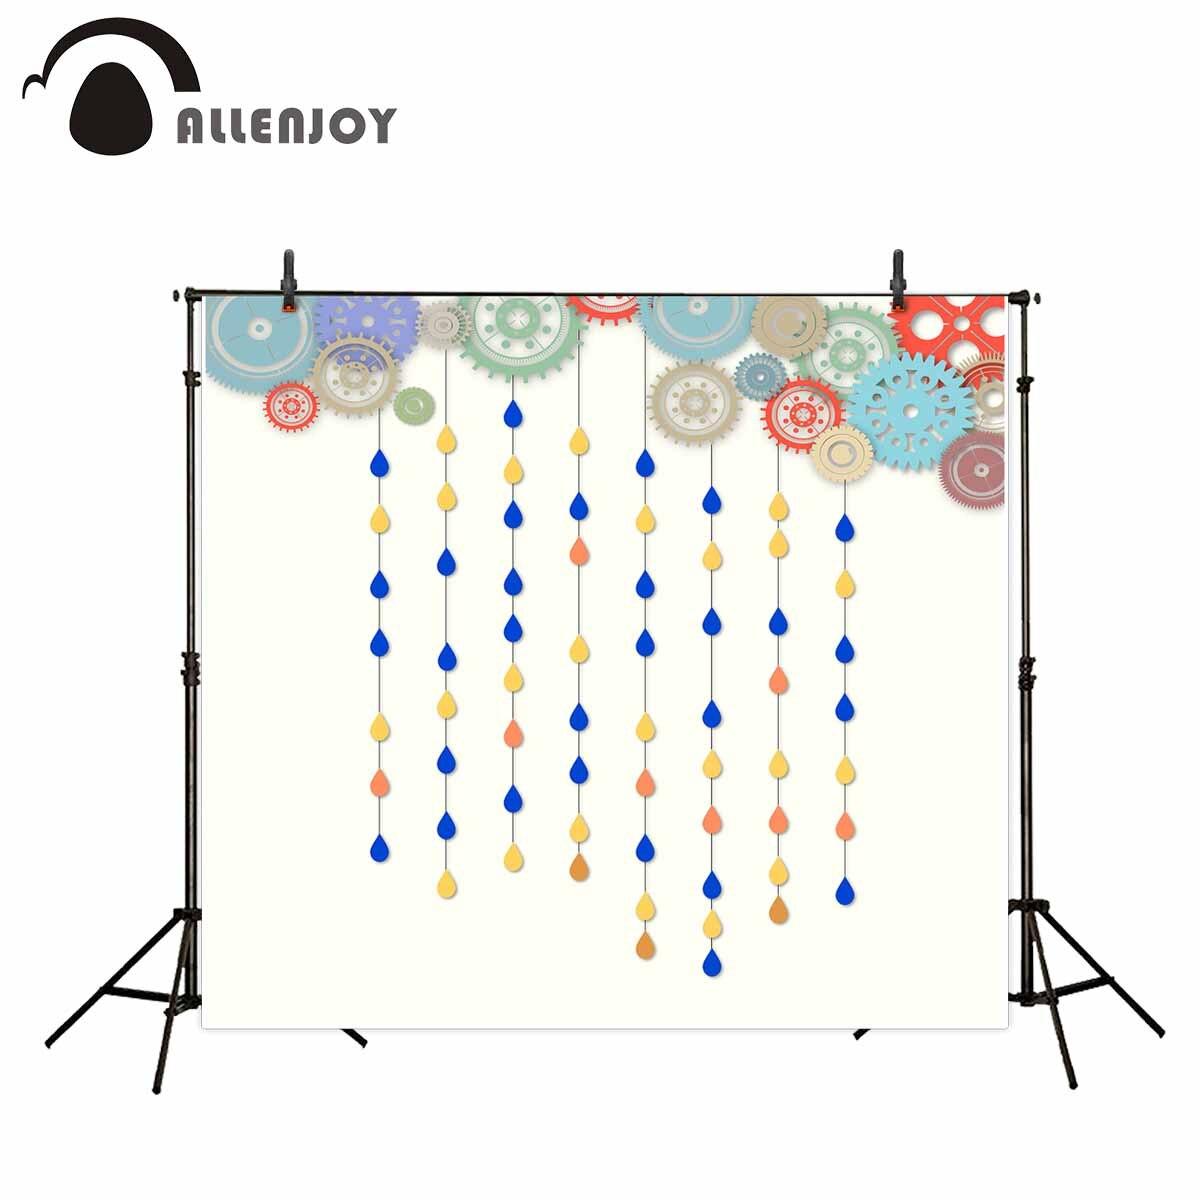 Allenjoy photographic backdrop colorful gear sevilla raindrop baby background photocall photobooth vinyl cloth fabric